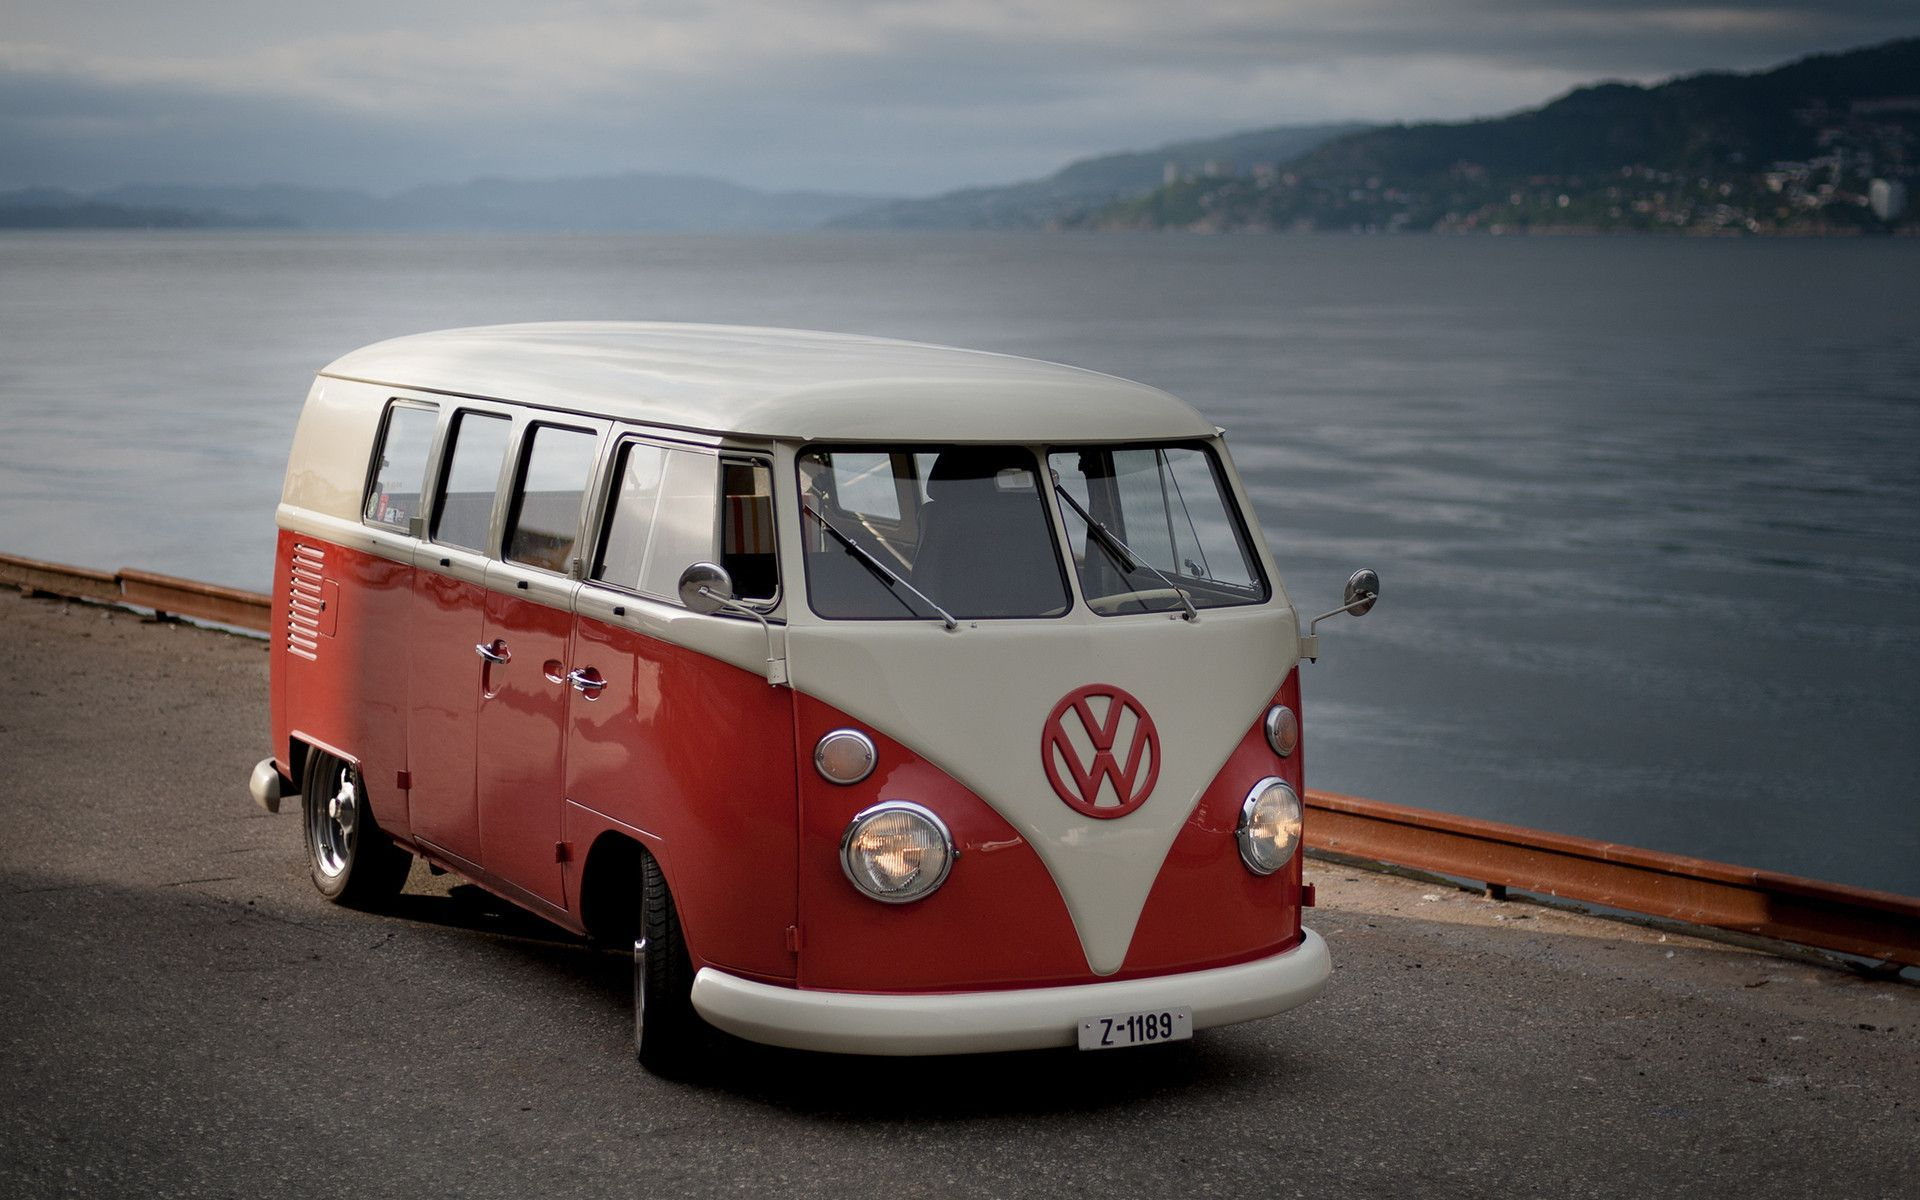 proxy image portal doka volkswagen ebayimg vanagon threads expedition camper syncro com forum sold bus